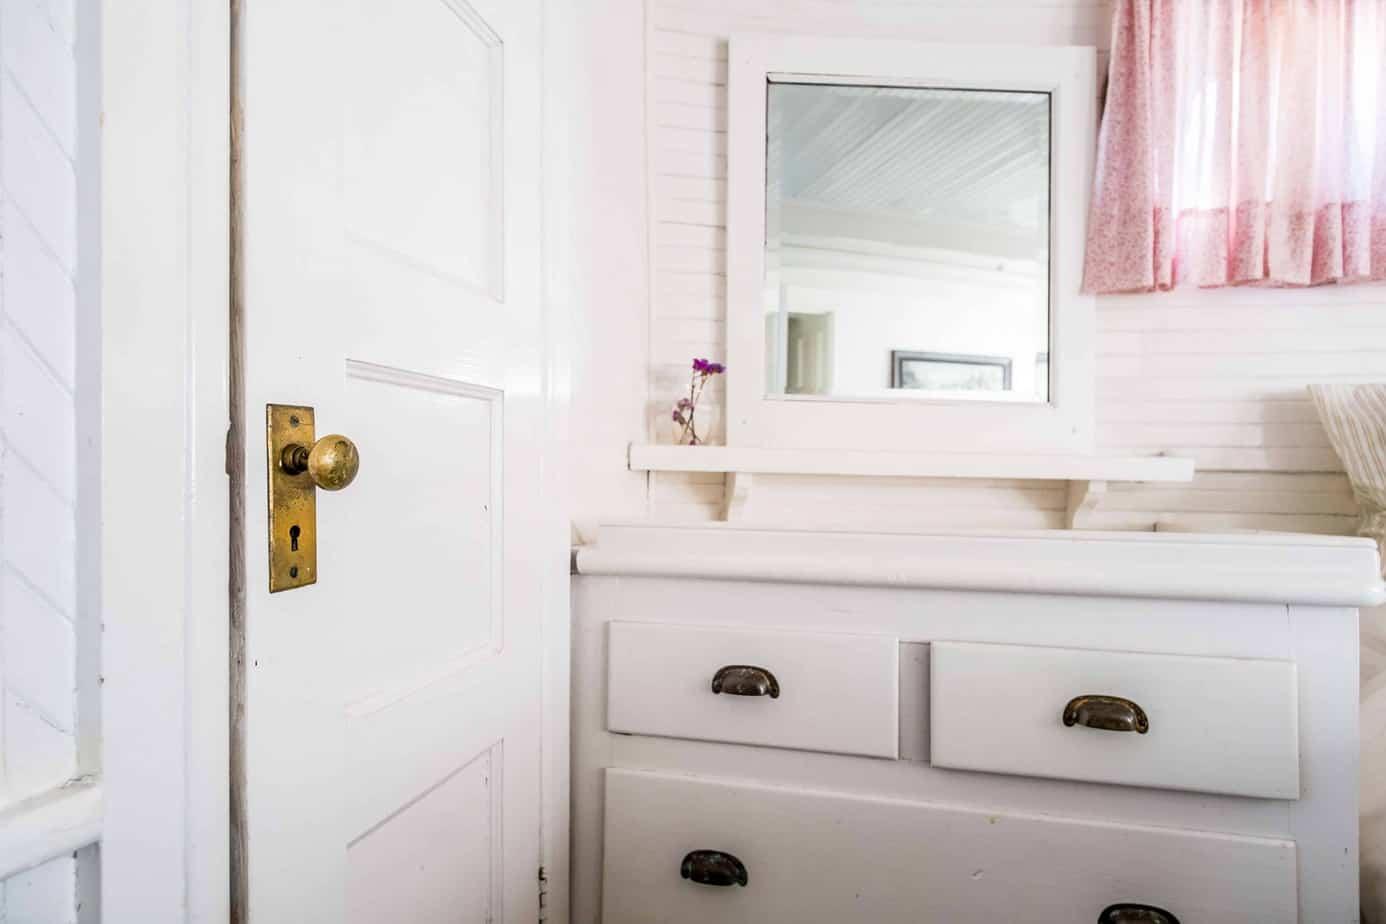 5 Tips To Keep Your Bathroom Organized